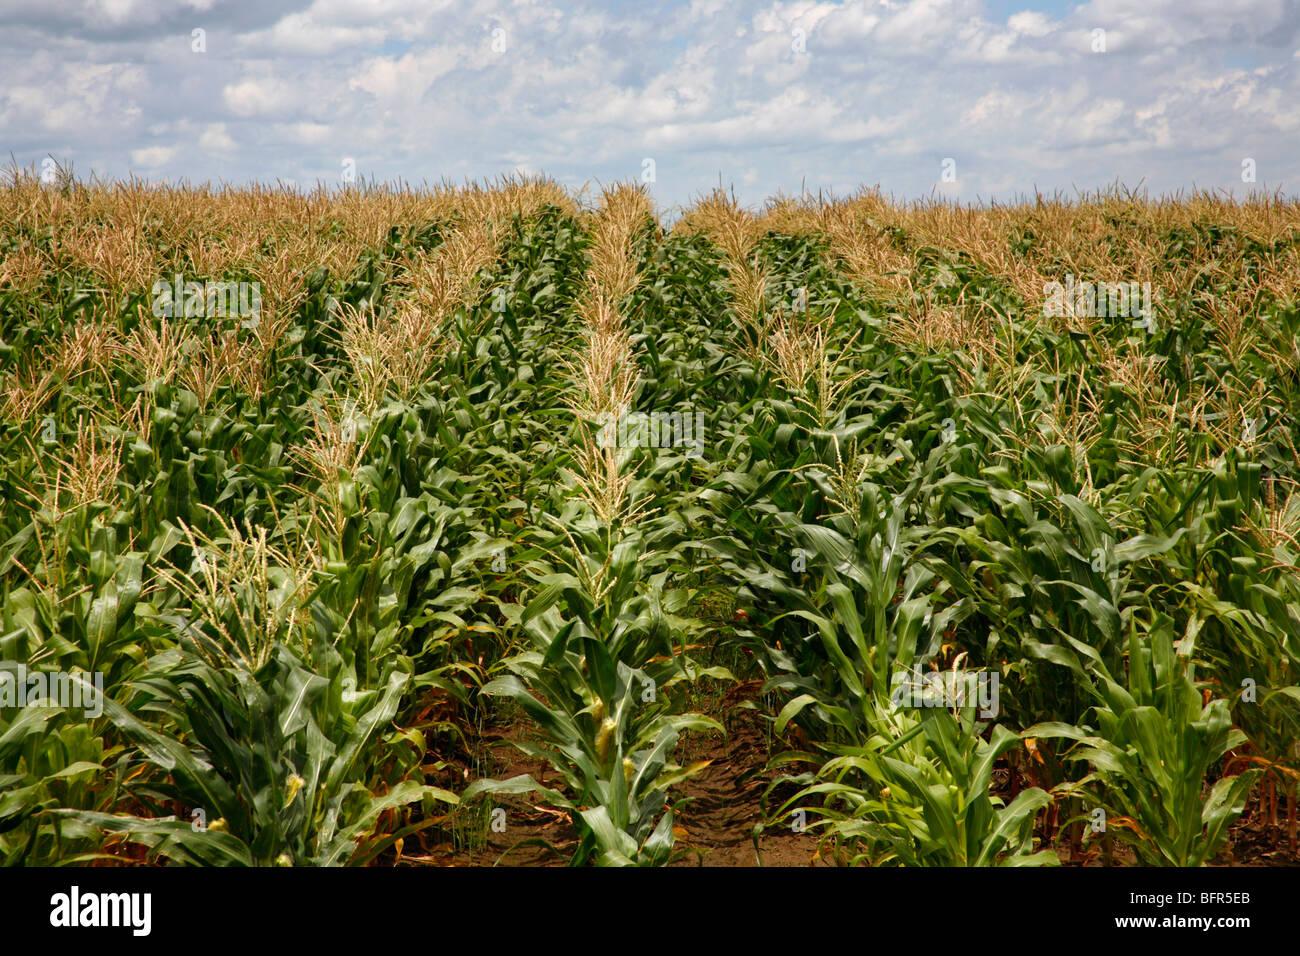 Campo de plantas de maíz Imagen De Stock